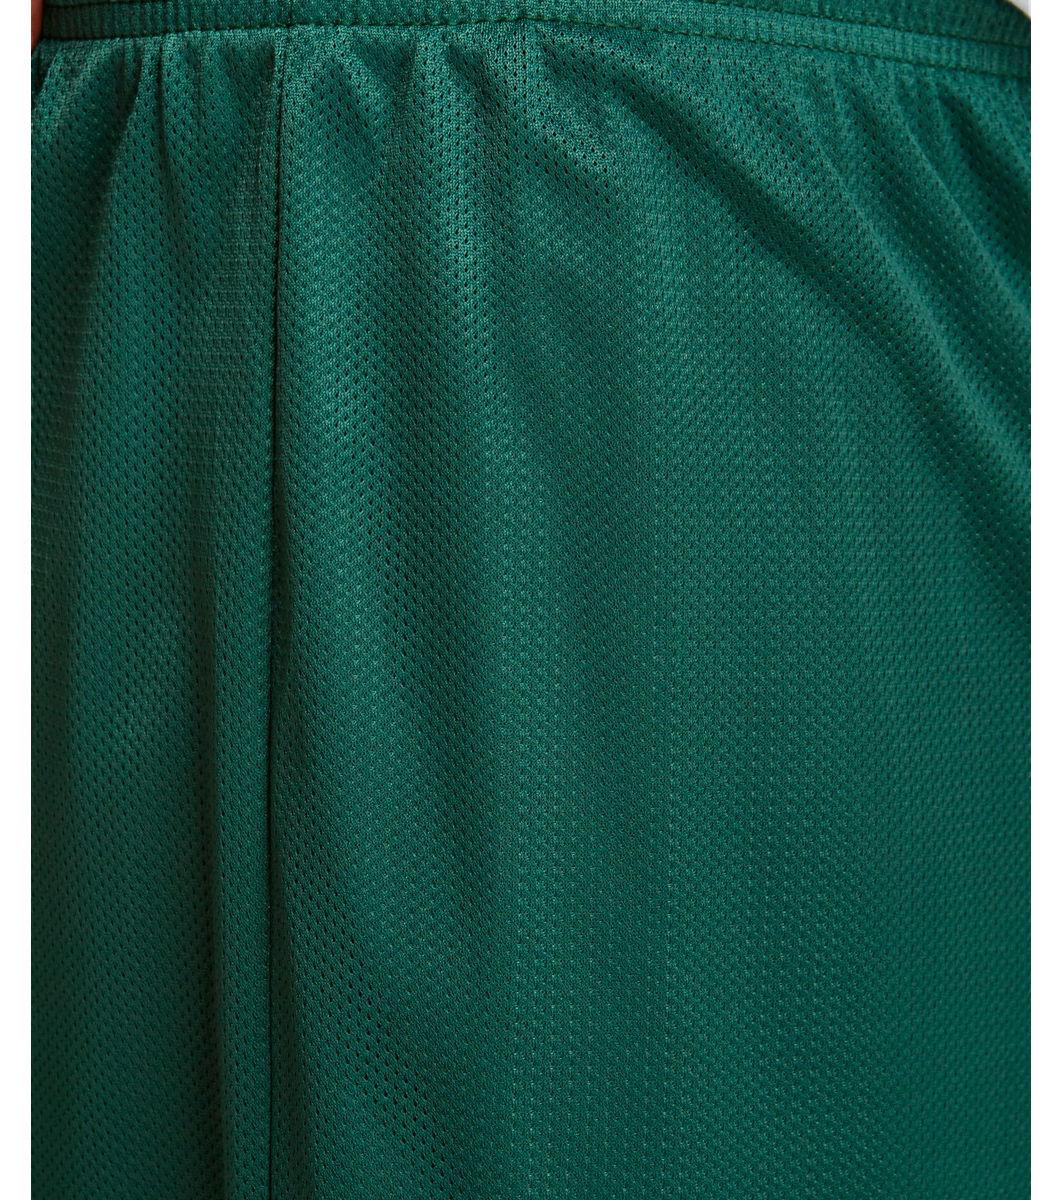 Soffe-Men-039-s-Nylon-Baggy-Legs-Elastic-Waistband-Drawstring-Mini-Mesh-Short-M058 thumbnail 8